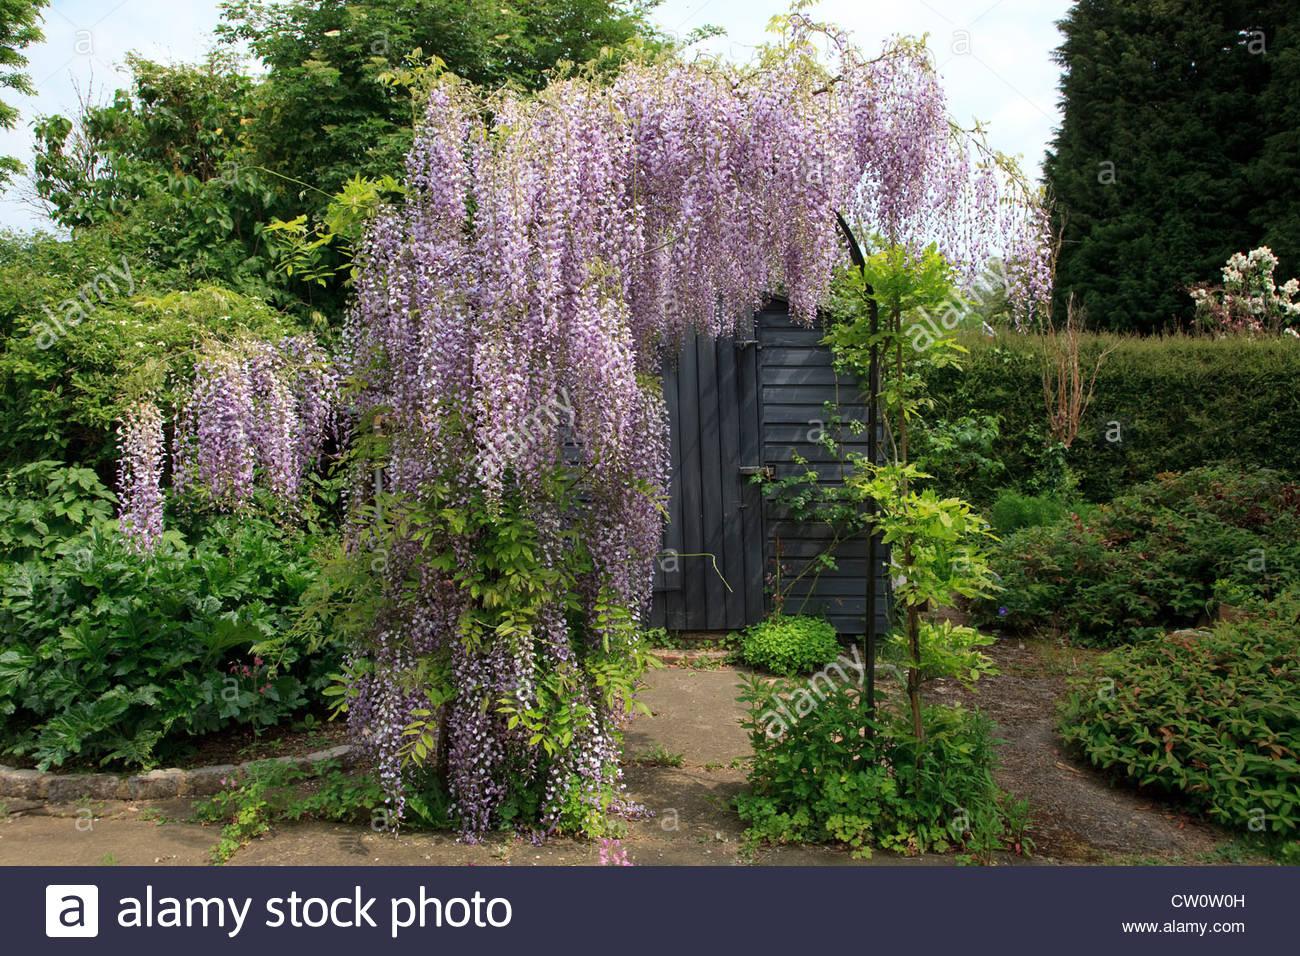 japanese-wisteria-CW0W0H.jpg